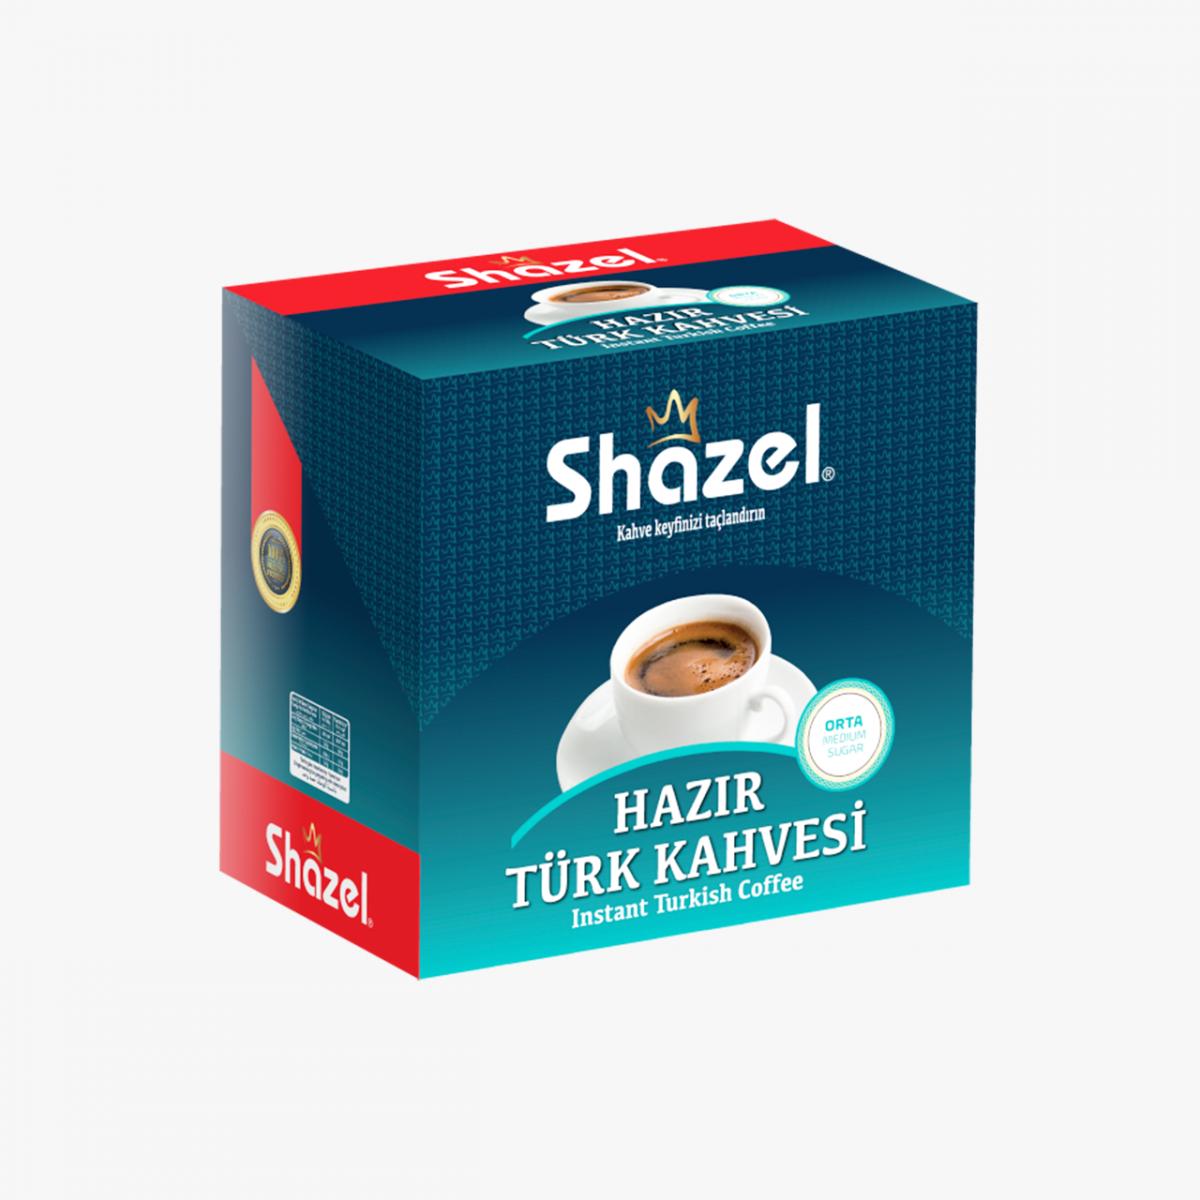 Hazır Türk Kahvesi Orta - 12'li Kutu